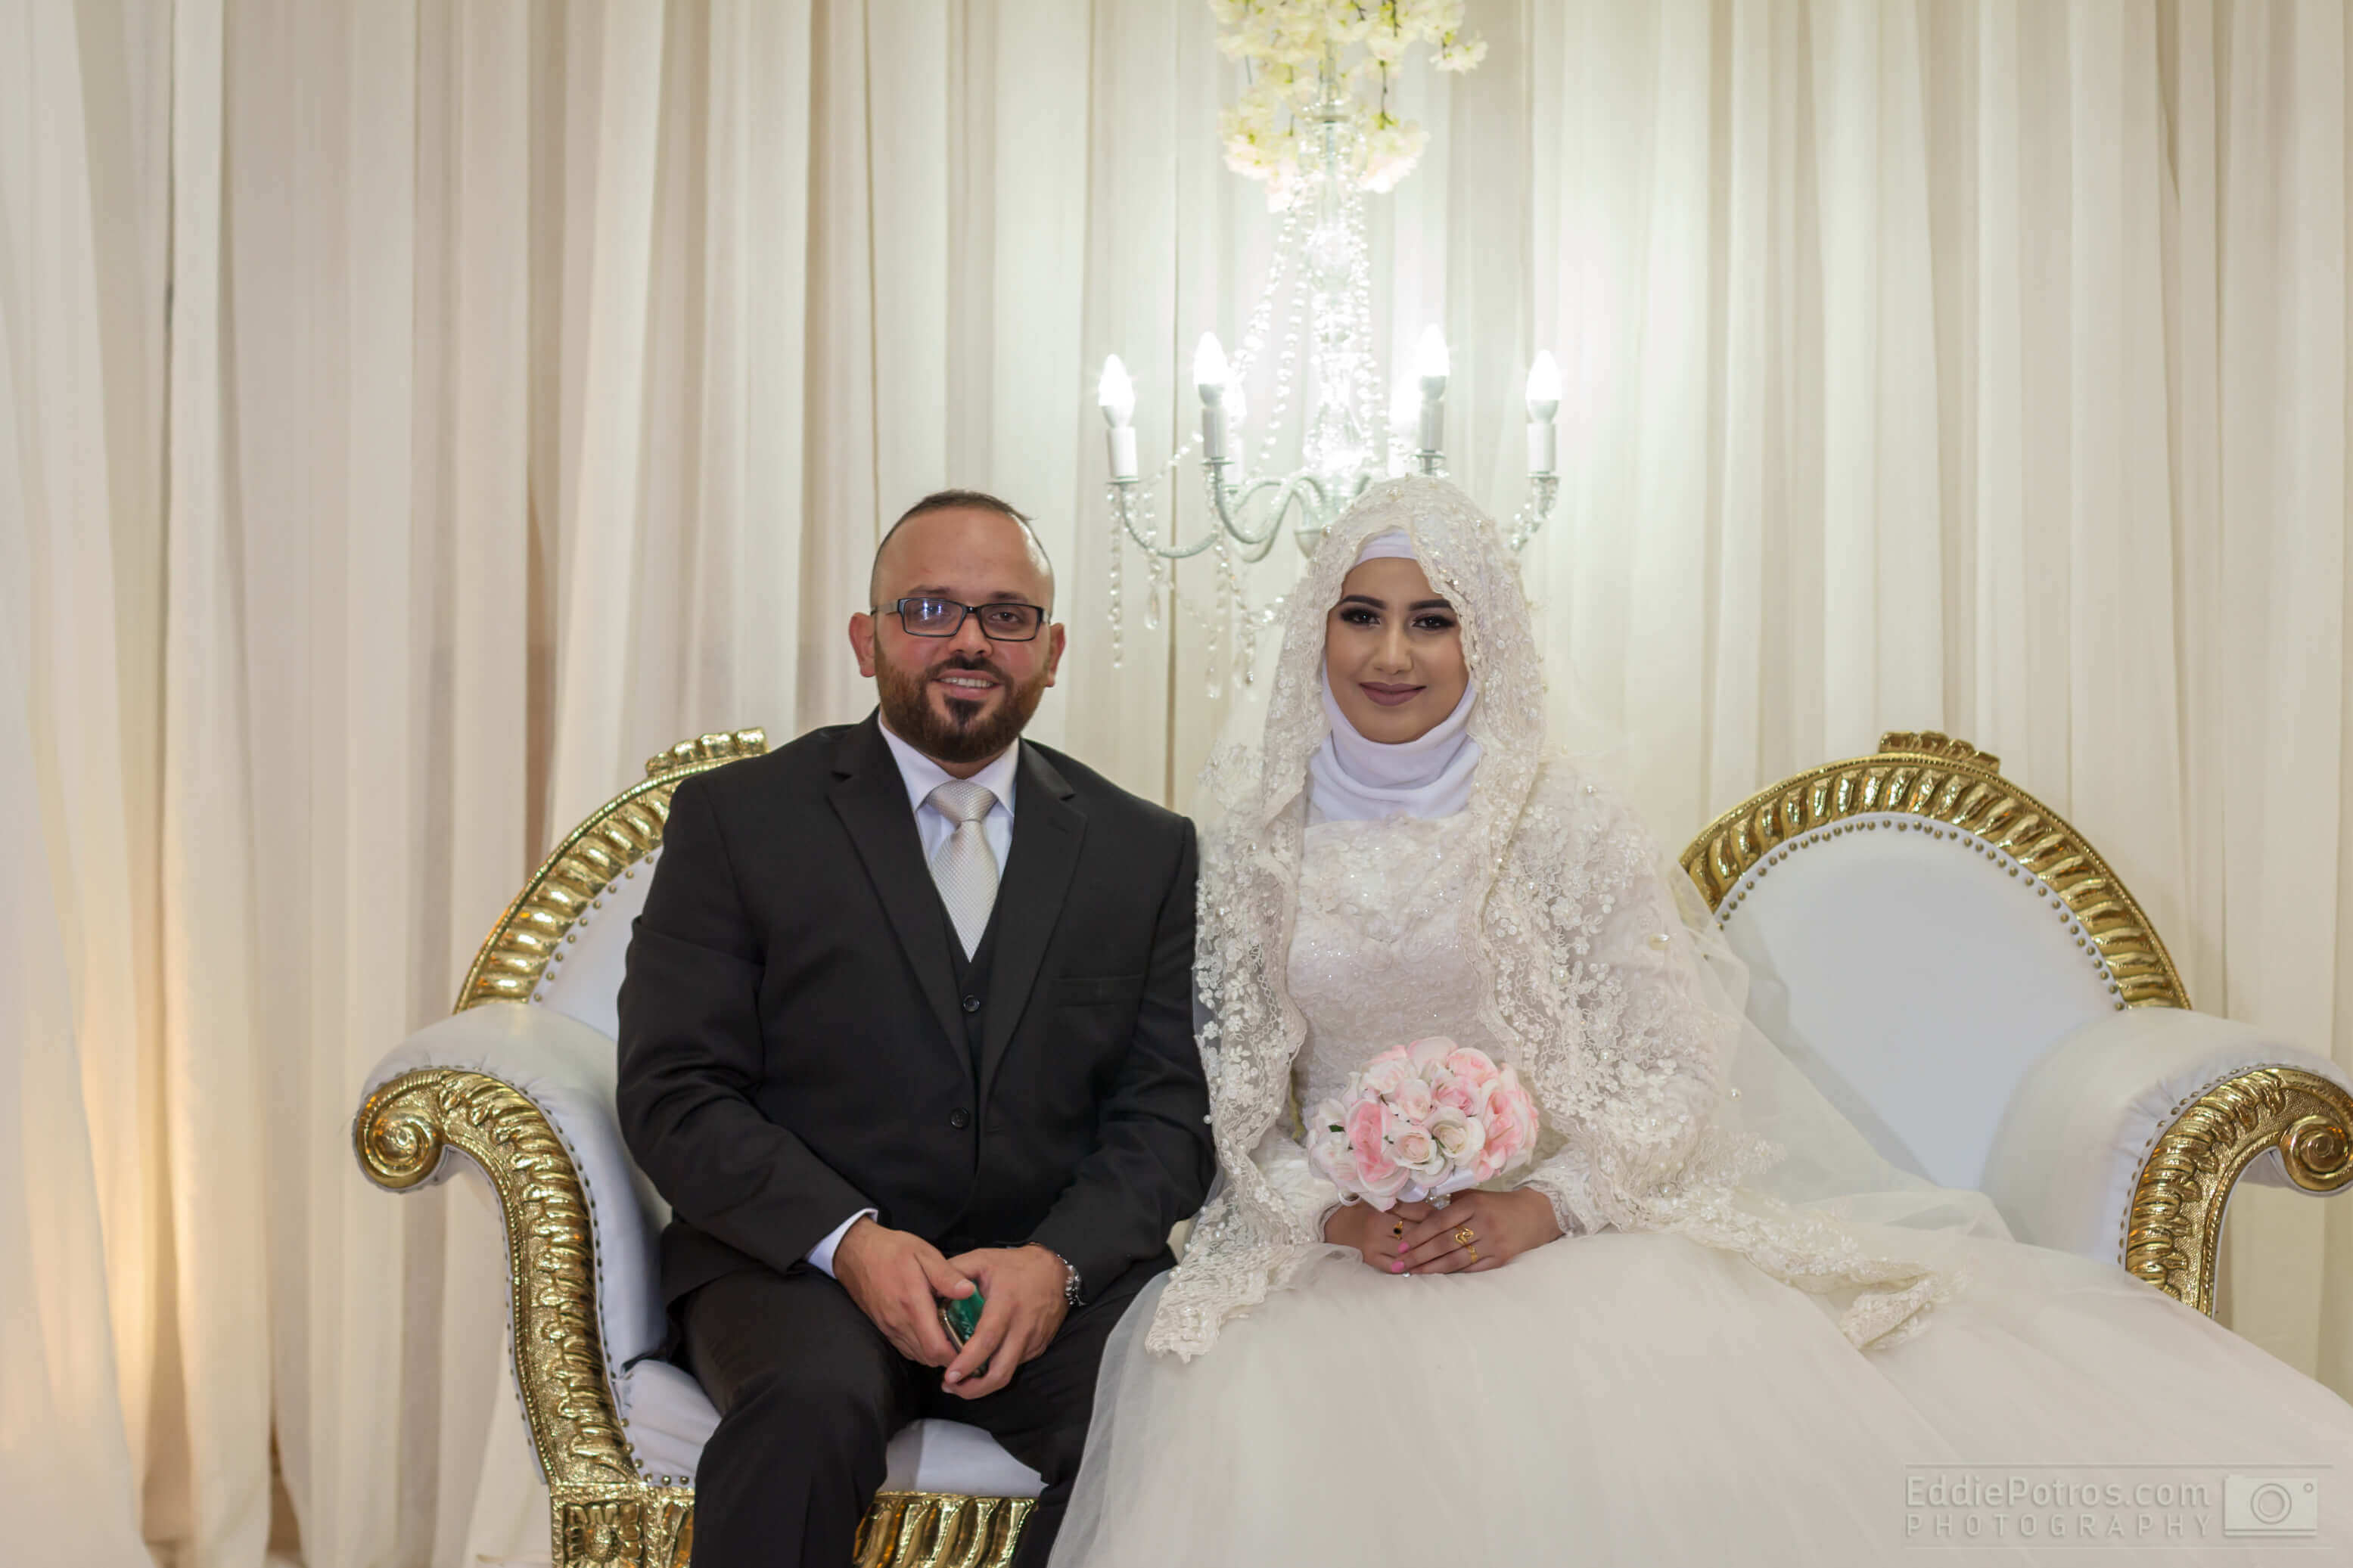 Congratulations Ahmad & Shahad on your Wedding - DJ Eddie